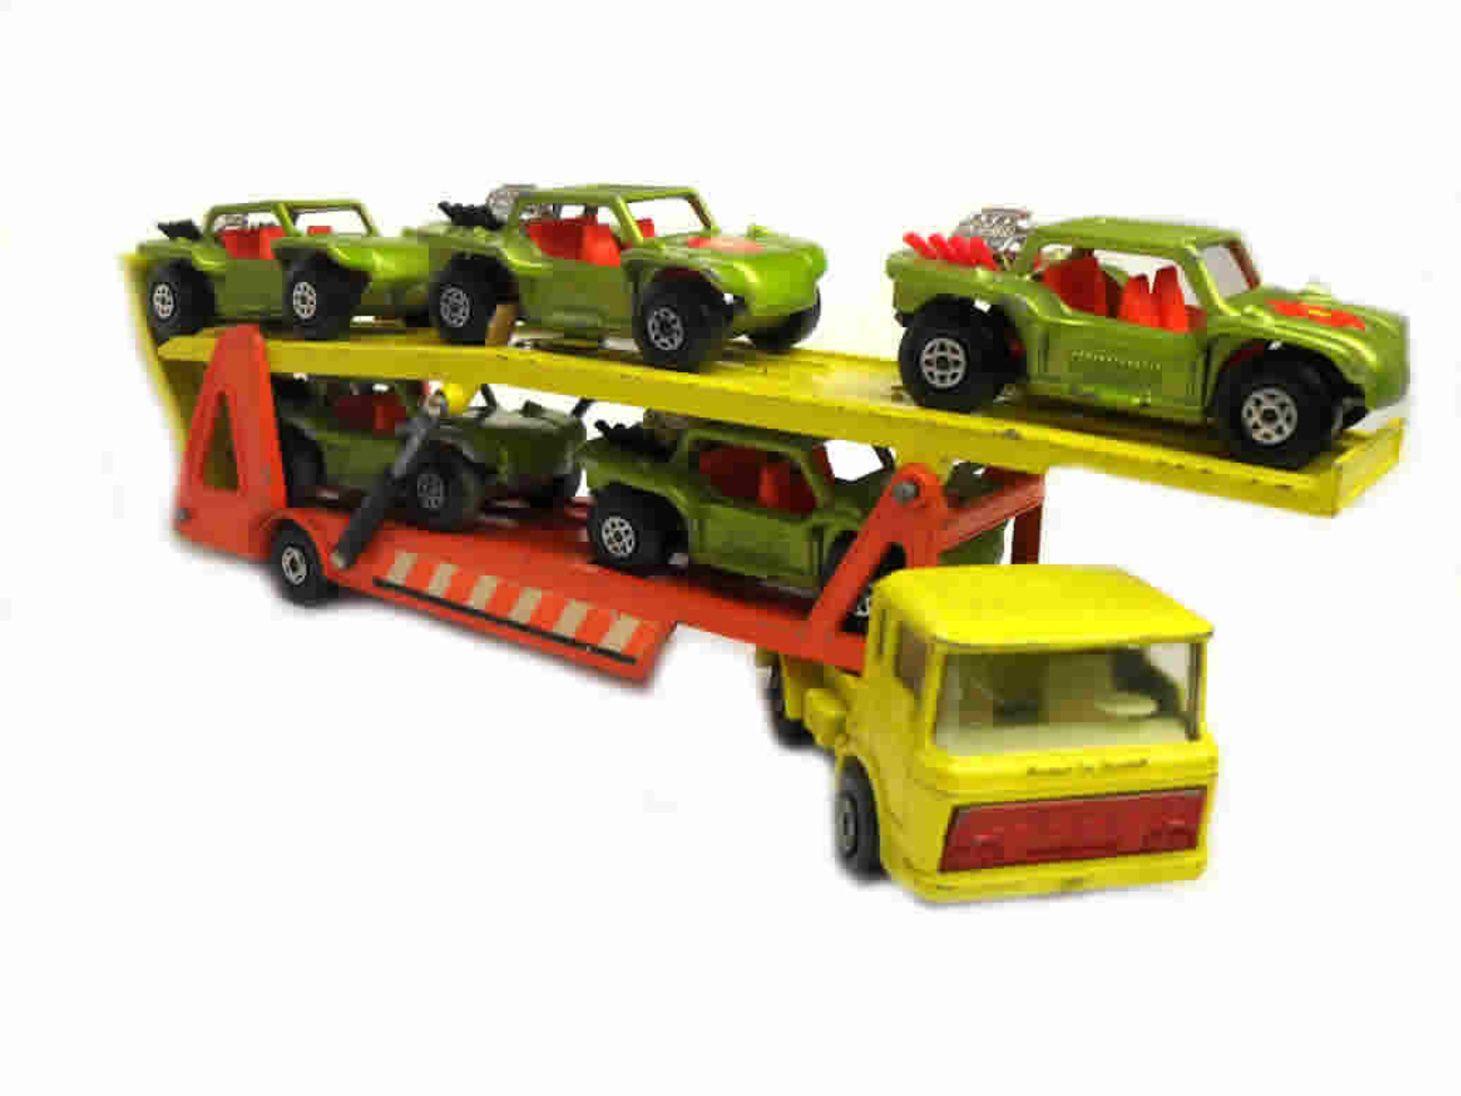 1970s Matchbox Super Kings No K11 Daf Car Transporter Yellow Orange Made In England Toys 1960s 60s Vintage Matchbox Ma In 2020 Matchbox Diecast Cars Diecast